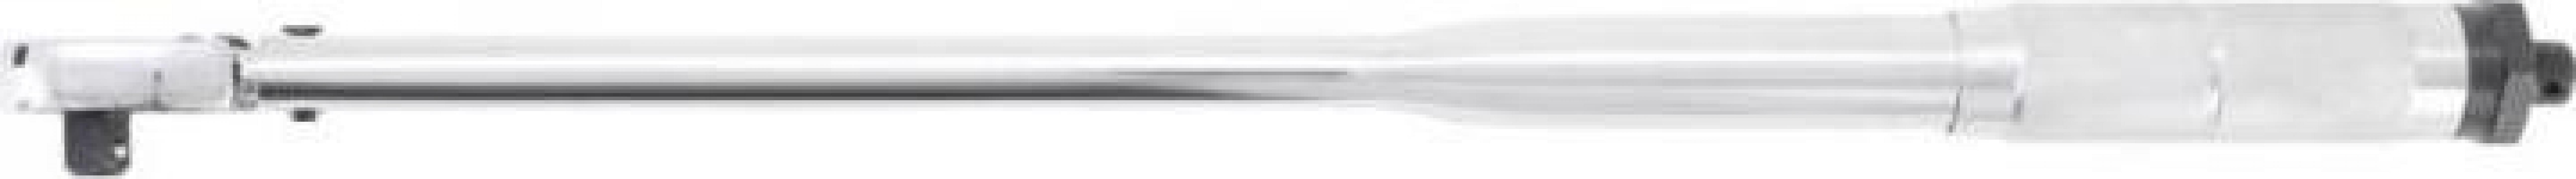 "Cheie dinamometrica 12,5 mm (1/2"") | 70 - 350 Nm -BGS"